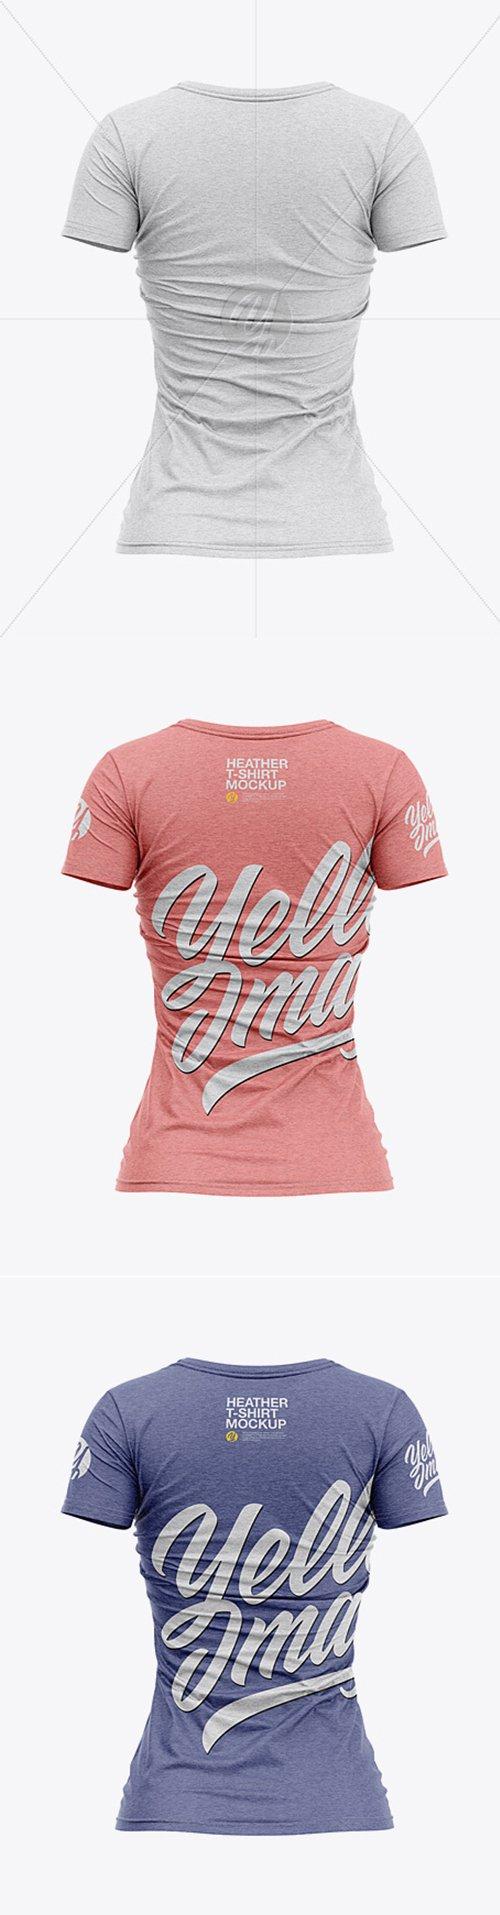 Womens Heather Slim-Fit V-Neck T-Shirt Mockup - Back View 32127 TIF